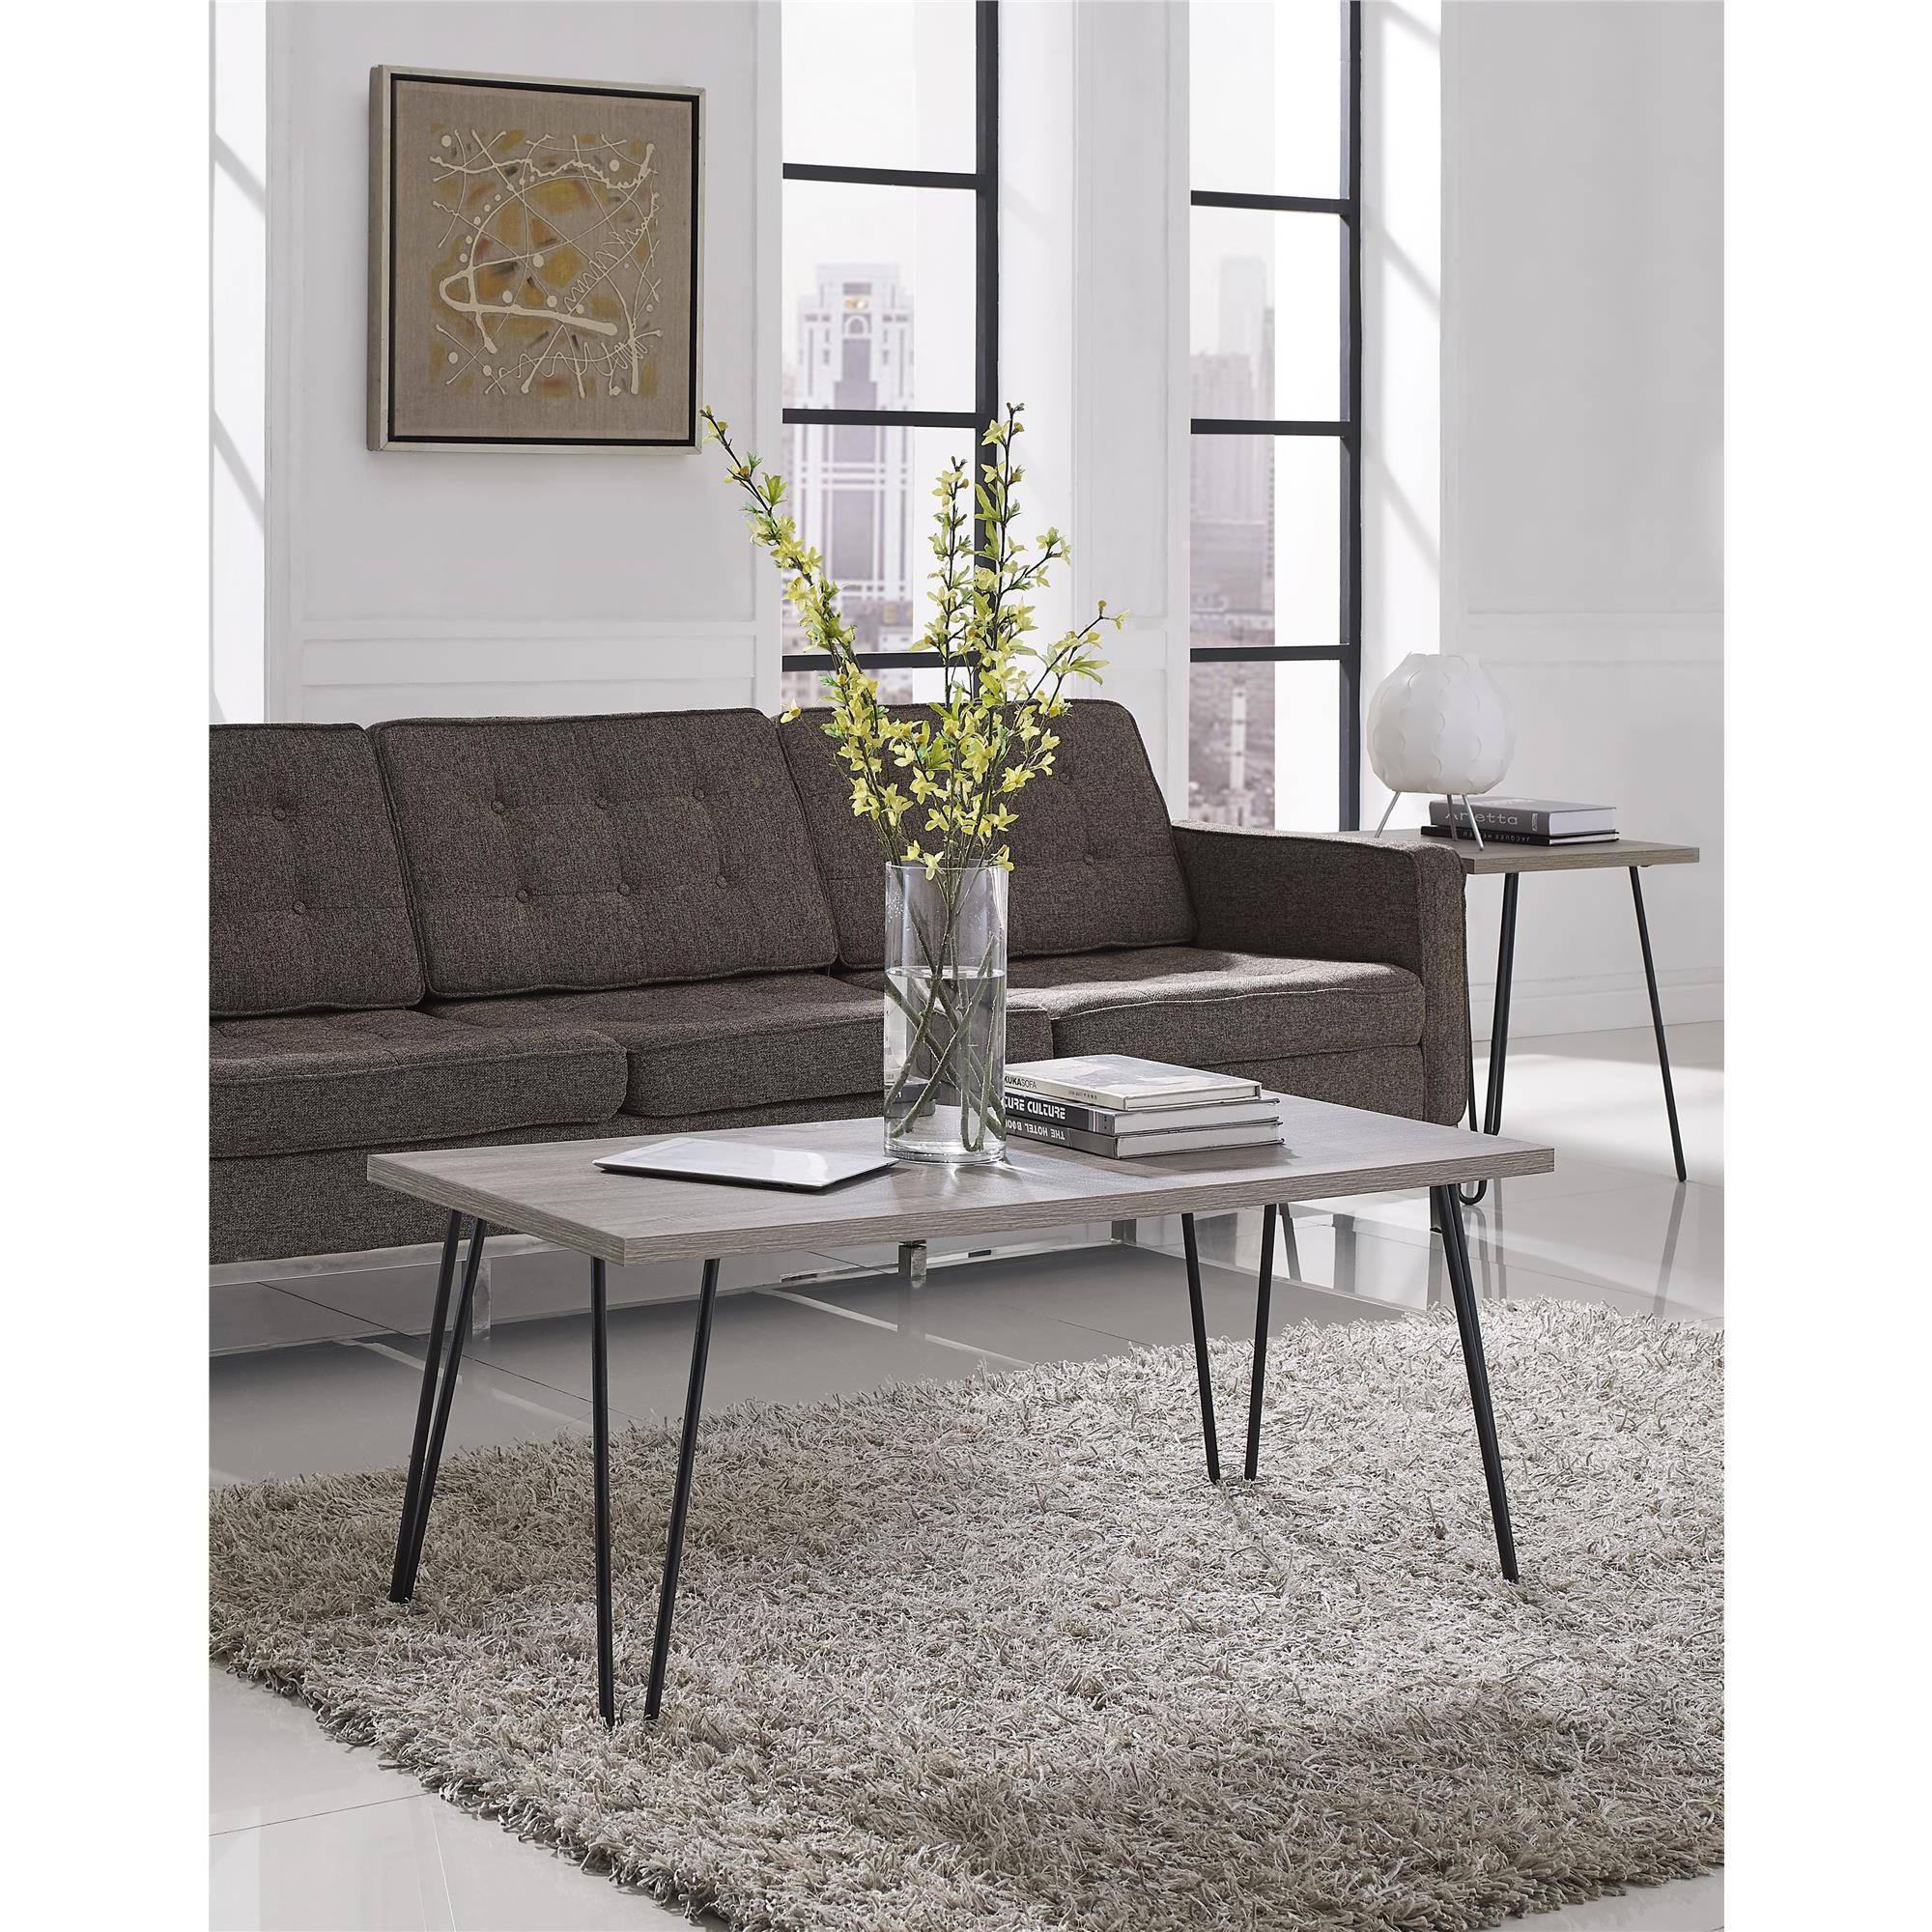 Ameriwood Home Owen Retro Coffee Table, Distressed Gray Oak/Gunmetal Gray